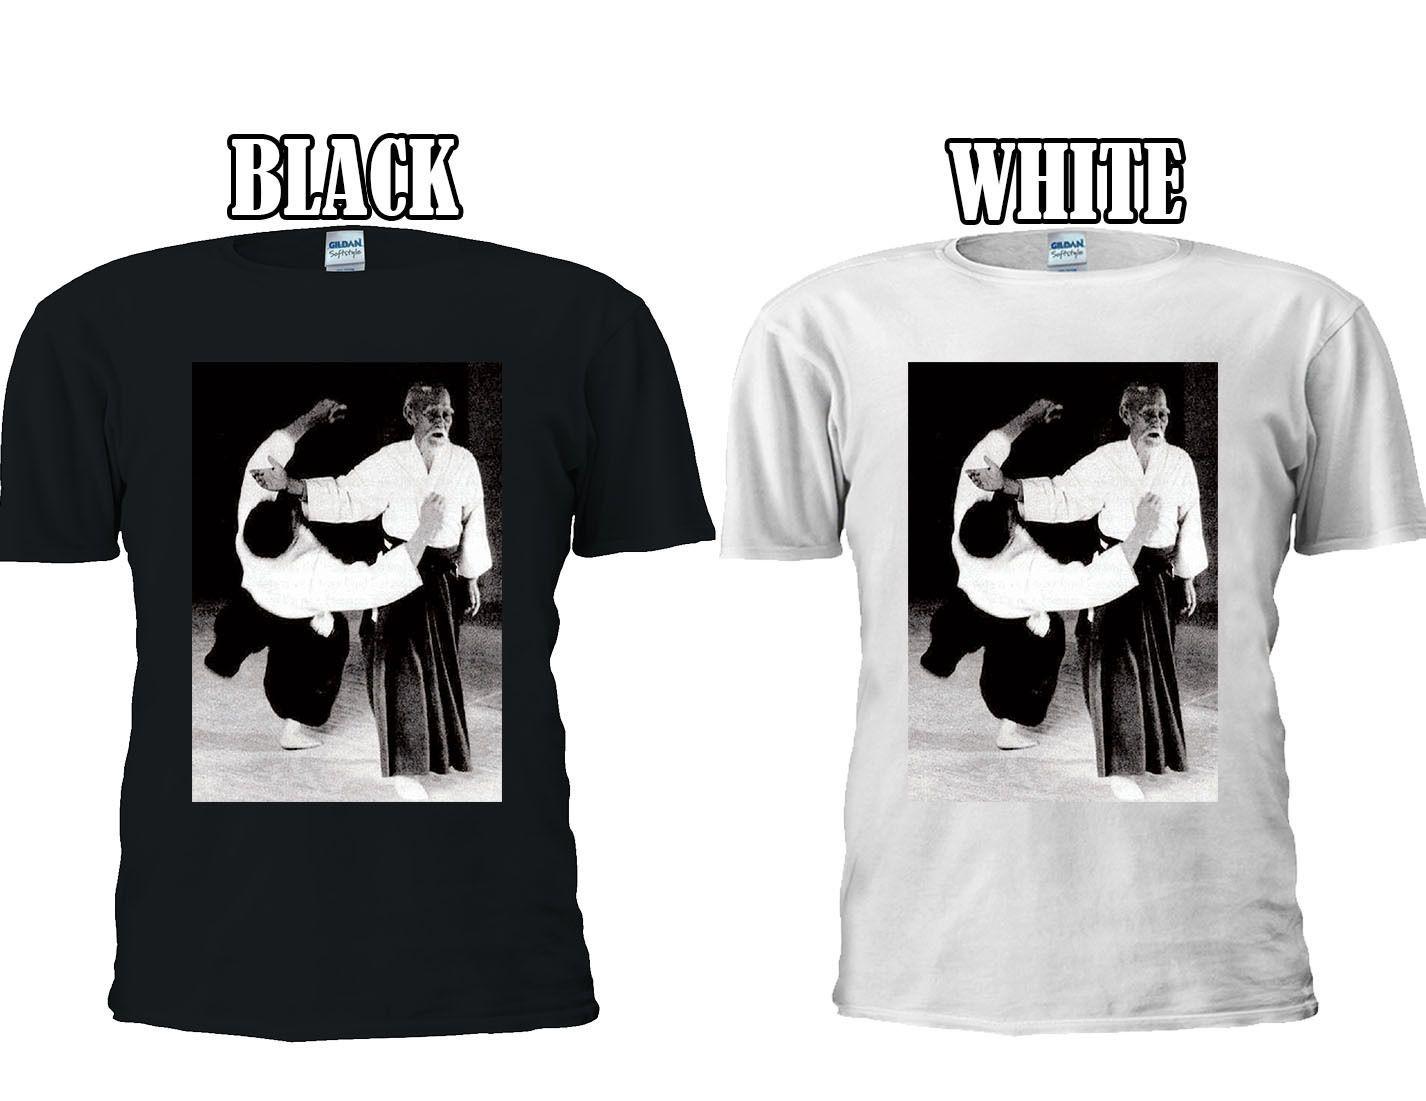 dda966ea3b1 Martial Arts Sensei Aikido Tumblr T Shirt Vest Tank Top Men Women Unisex  1321 Tee Shirt Online Shopping 24 Hour Tee Shirts From Moviethirt